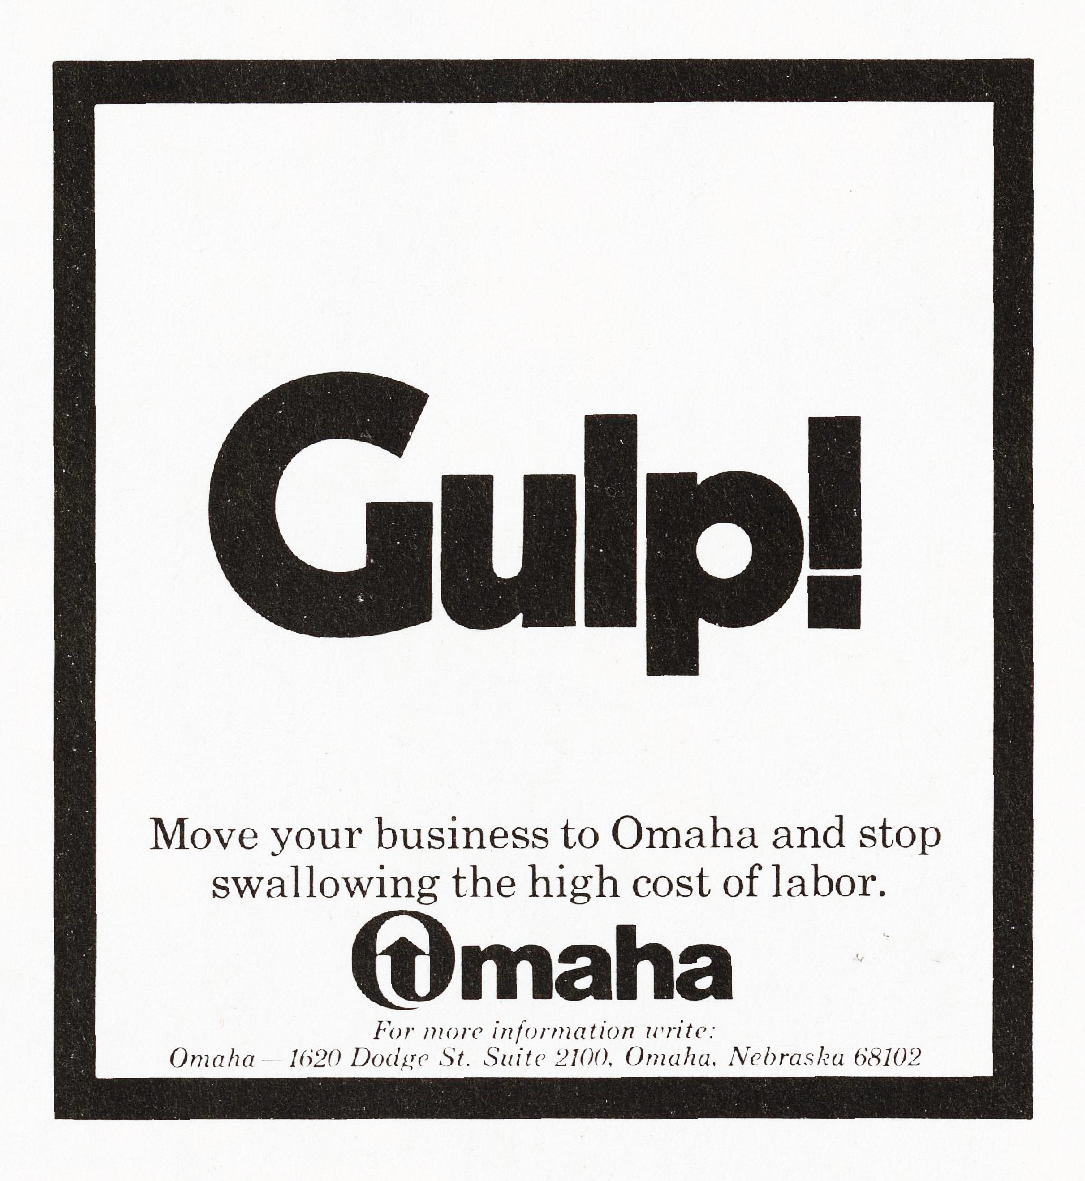 gulp-omaha-tom-mcelligott-ron-anderson-bozell-01